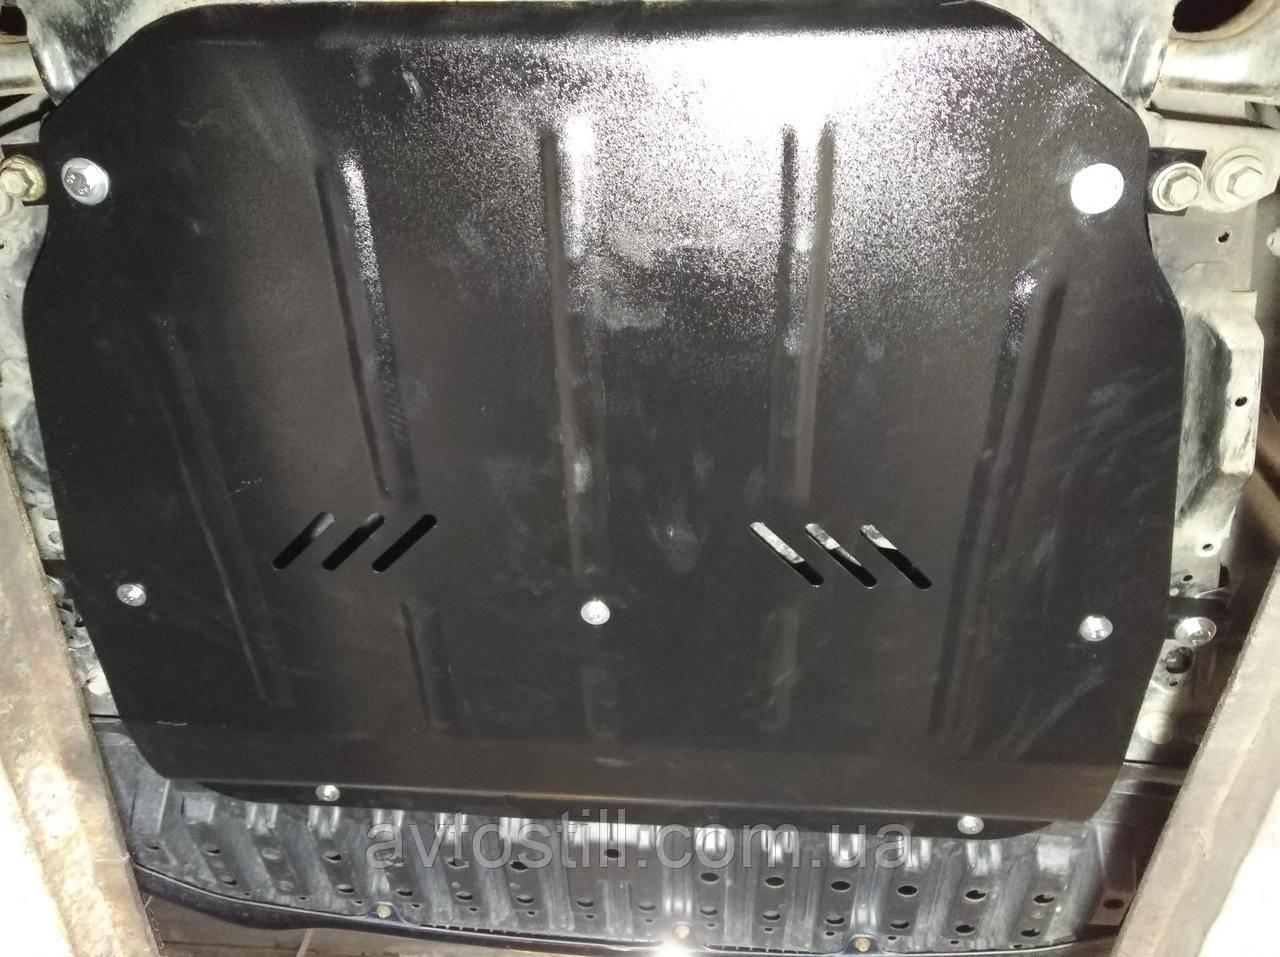 Захист картера двигуна Toyota Avensis 3 (T27) (2009-2012) | Тойота Авенсіс